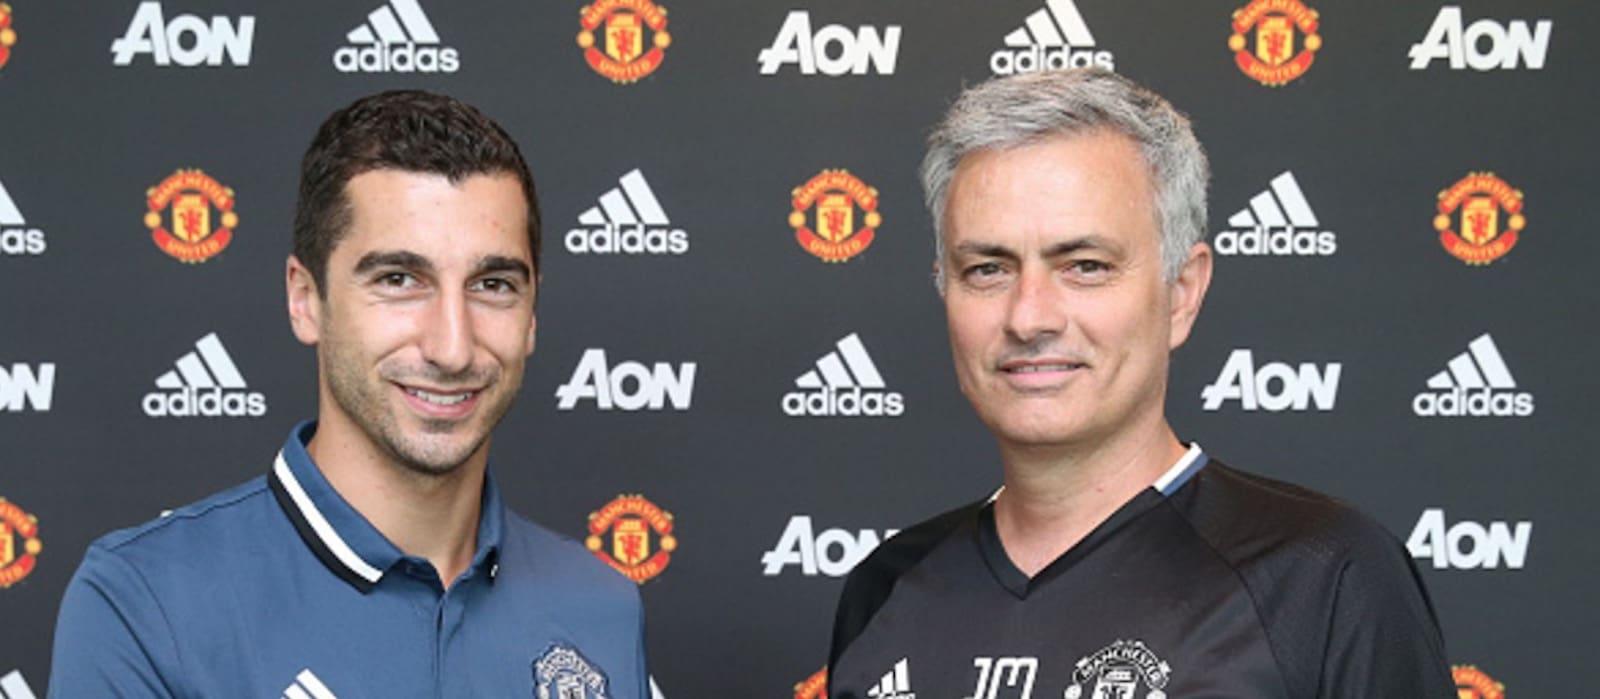 Adnan Januzaj welcomes Henrikh Mkhitaryan to Manchester United